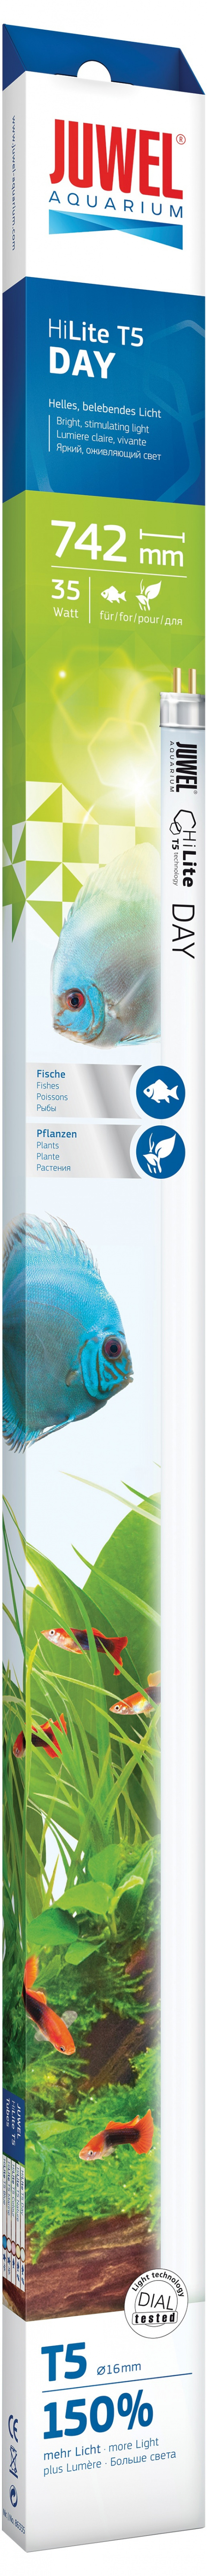 Лампа для аквариума - High-Lite Day T5 35W 742mm title=